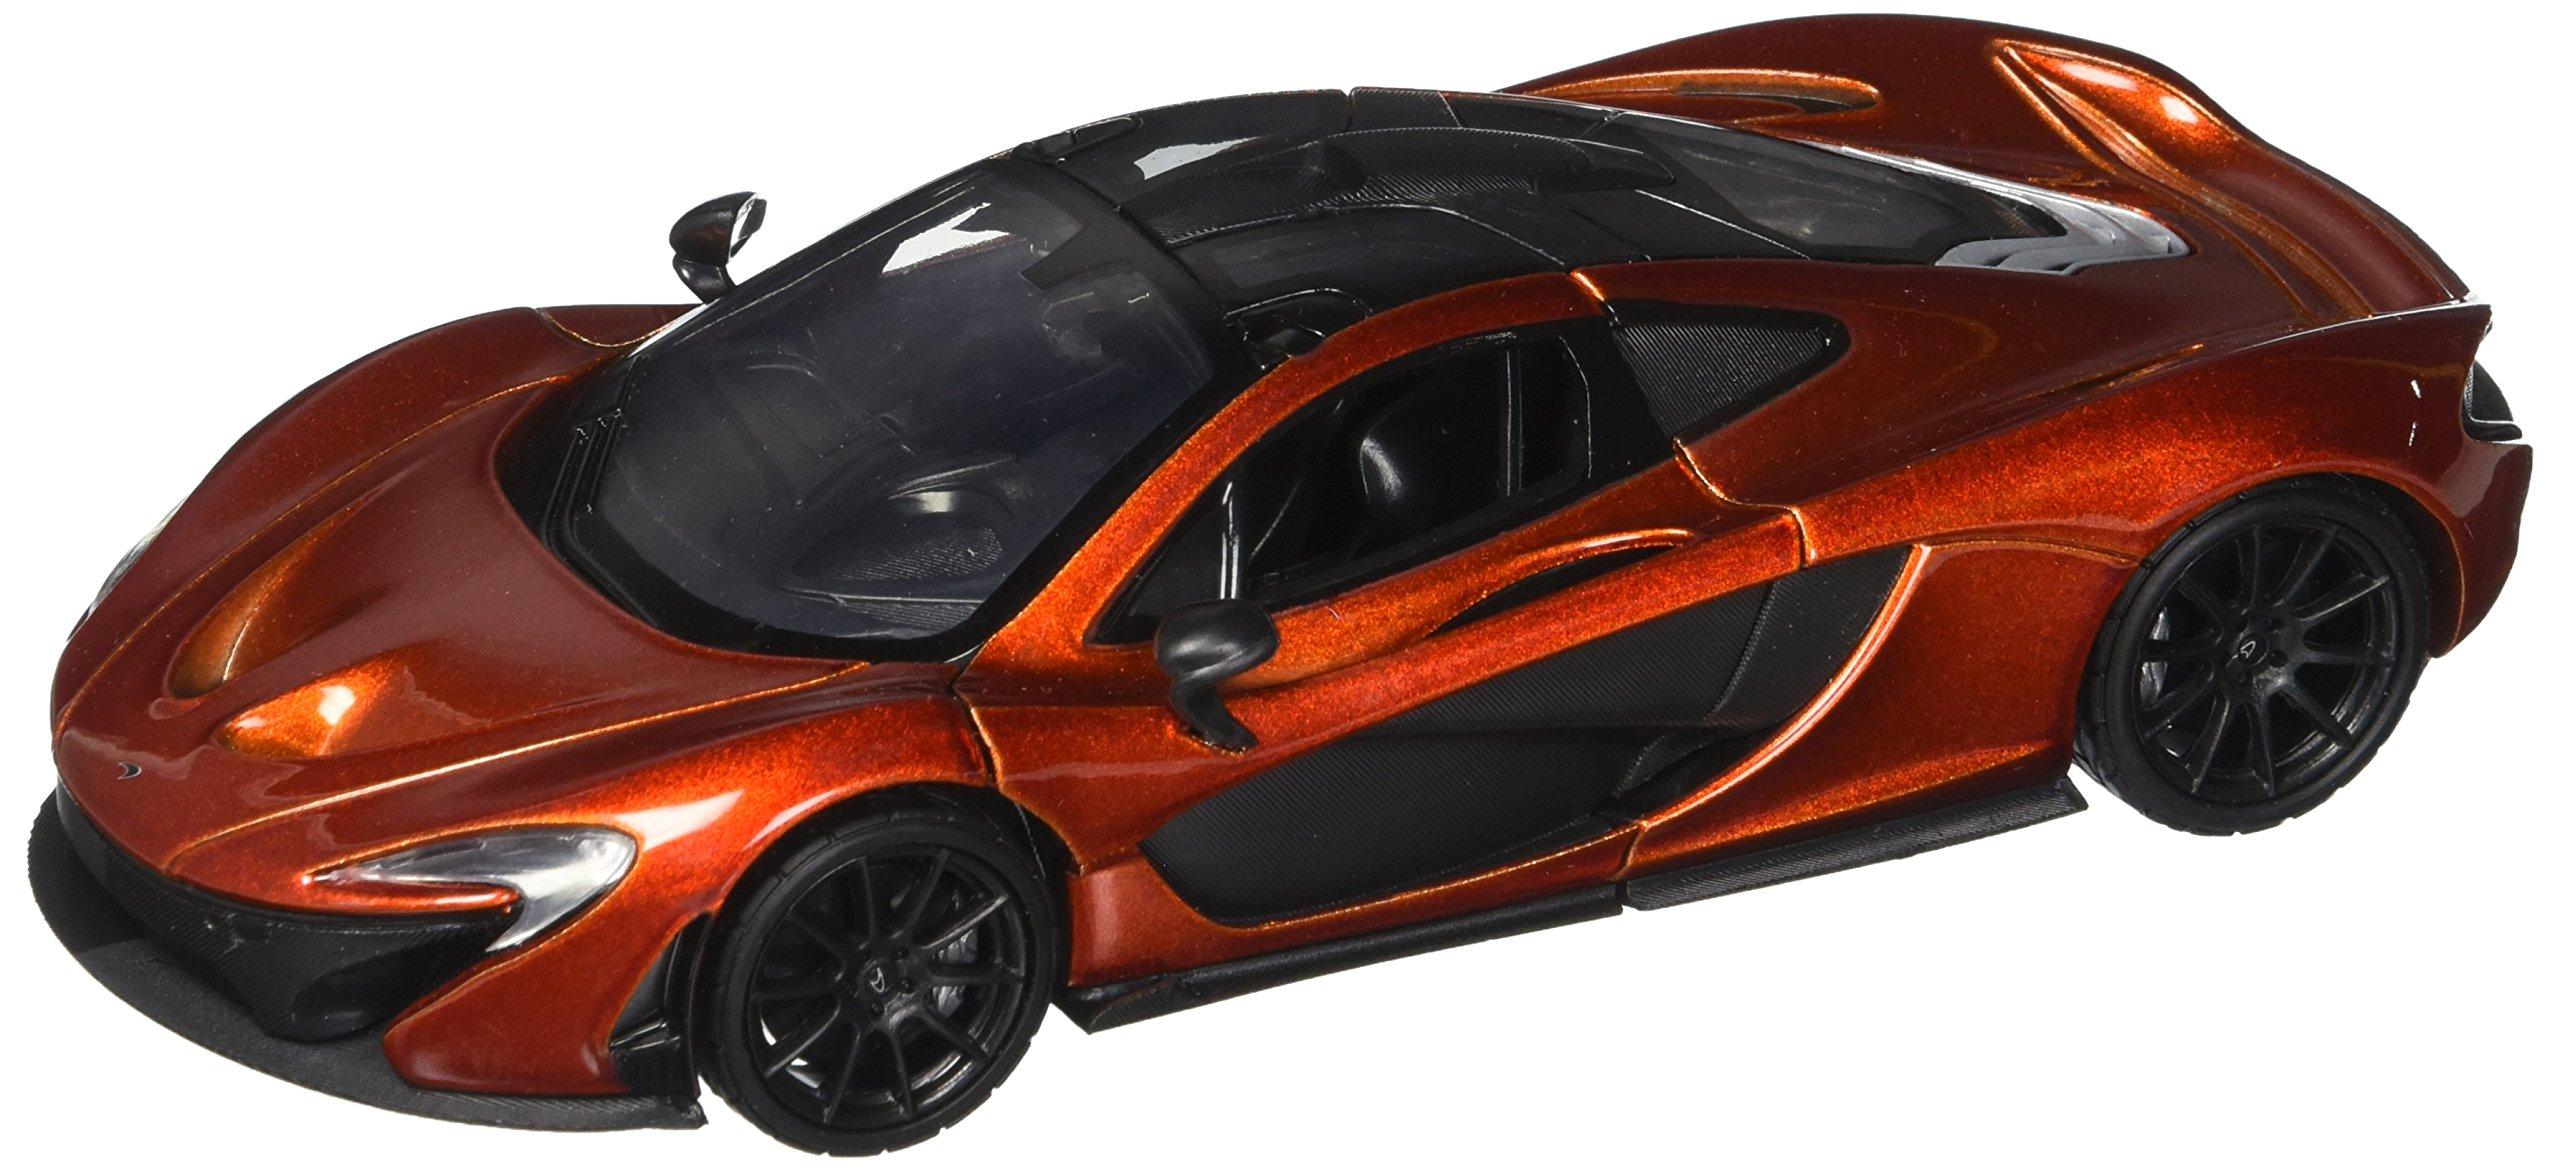 Motor Max 1:24 W/B Mclaren P1 Diecast Vehicle, Metallic Orange